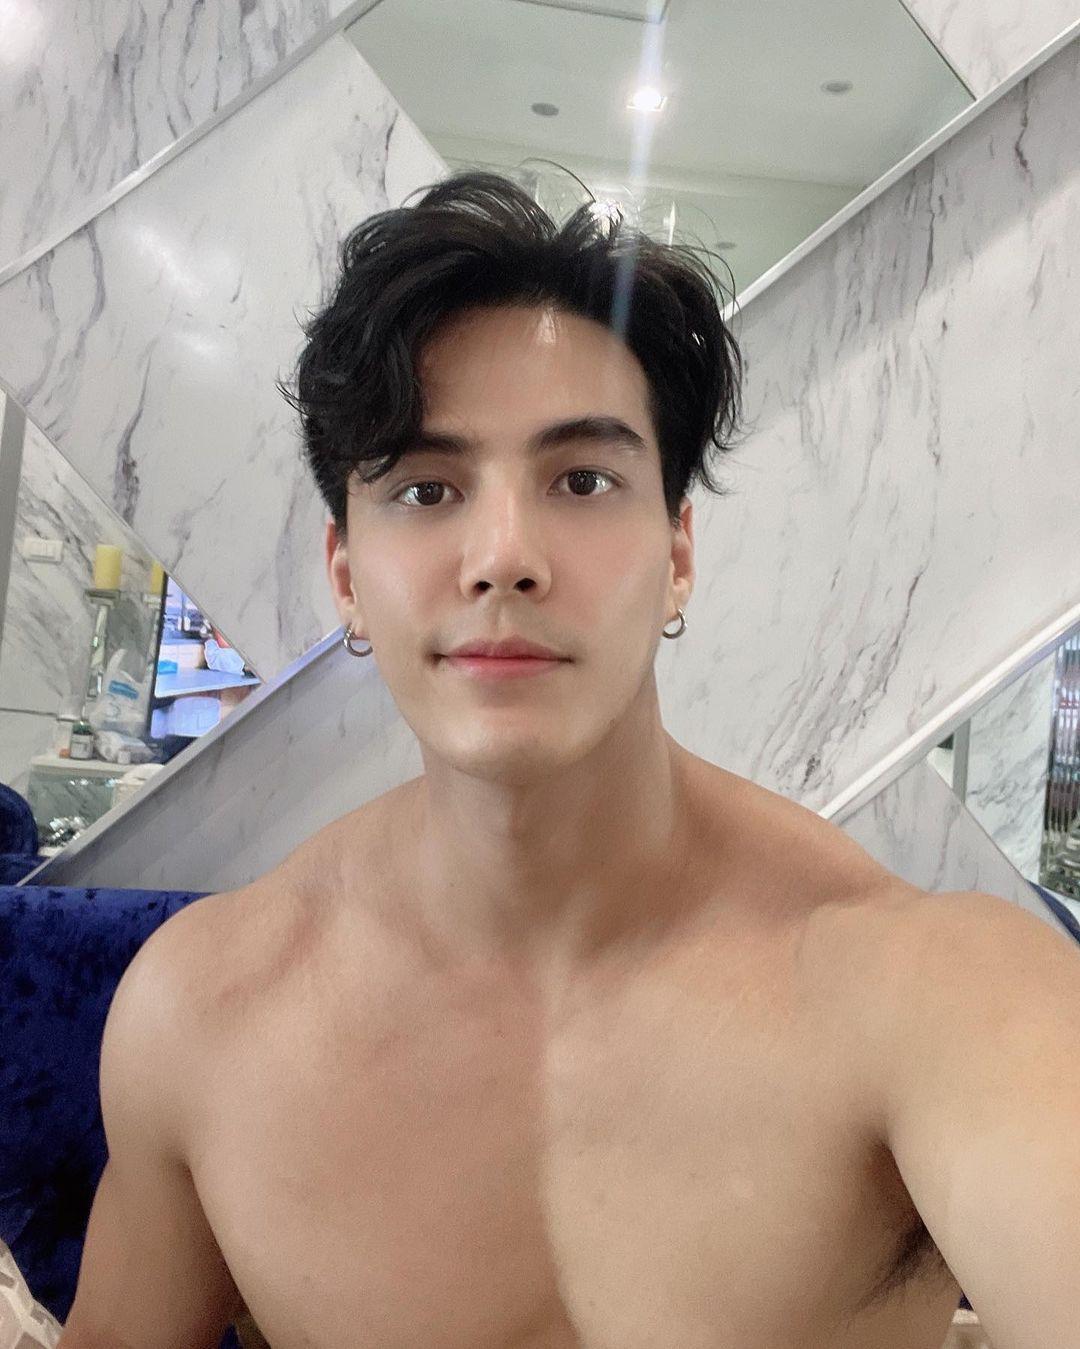 Shira Theo Jeerakulchan, mẫu 6 múi Bangkok sexy